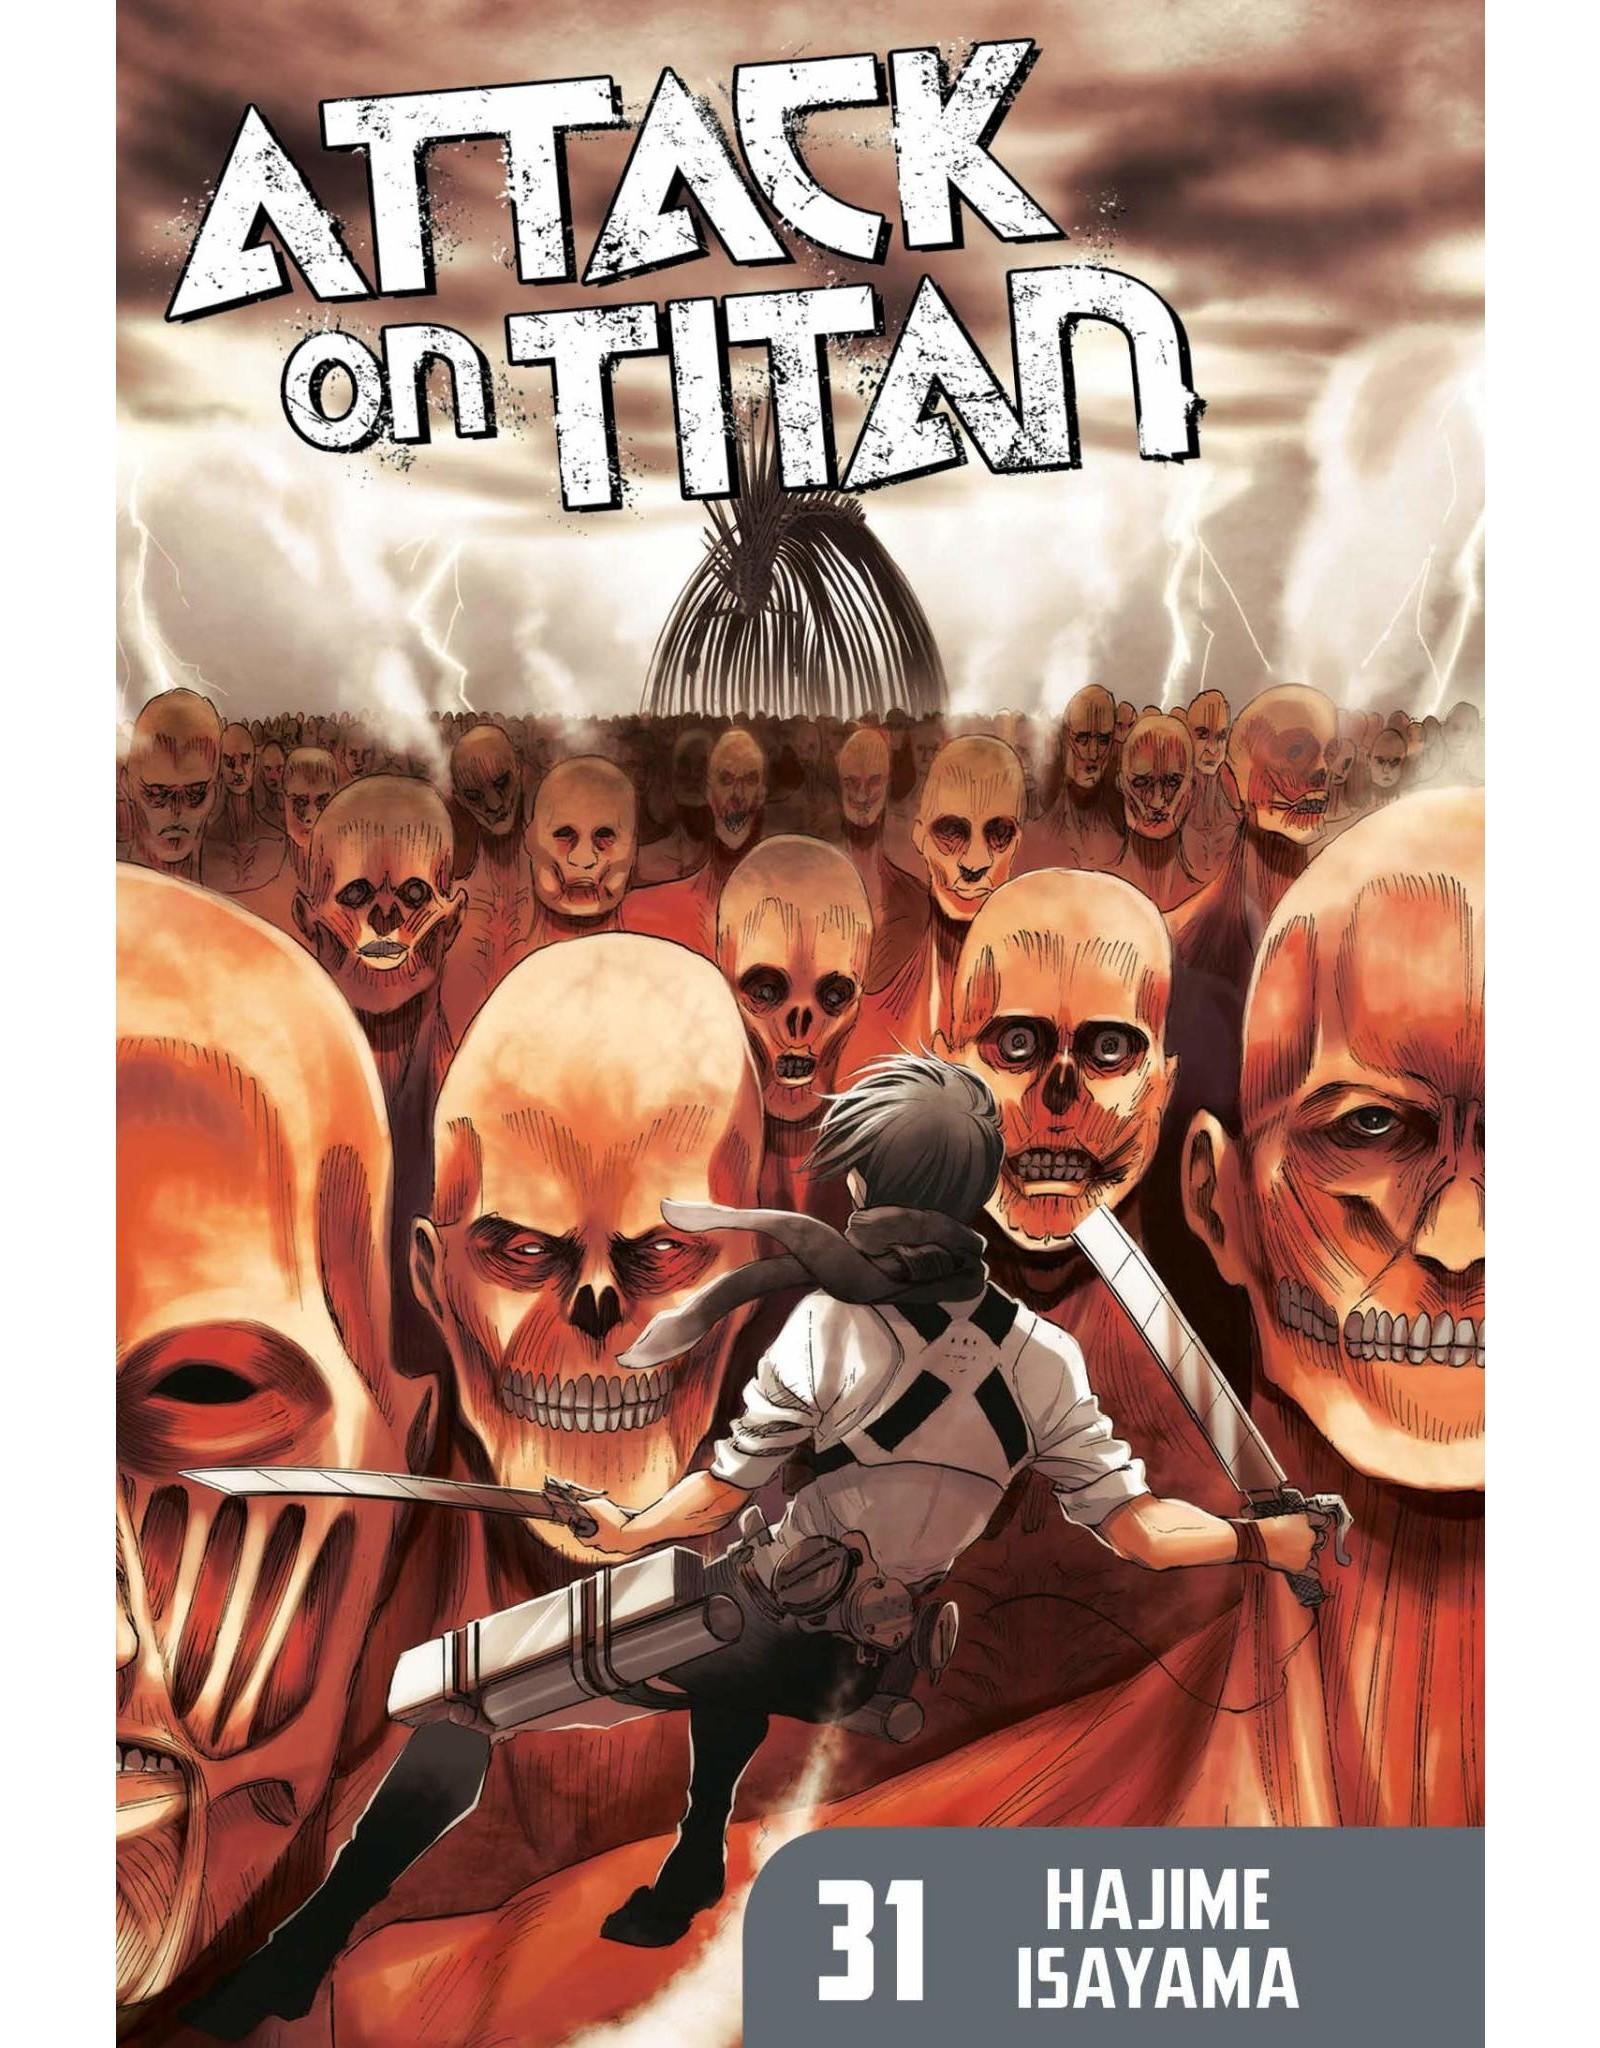 Attack on Titan 31 (English version)